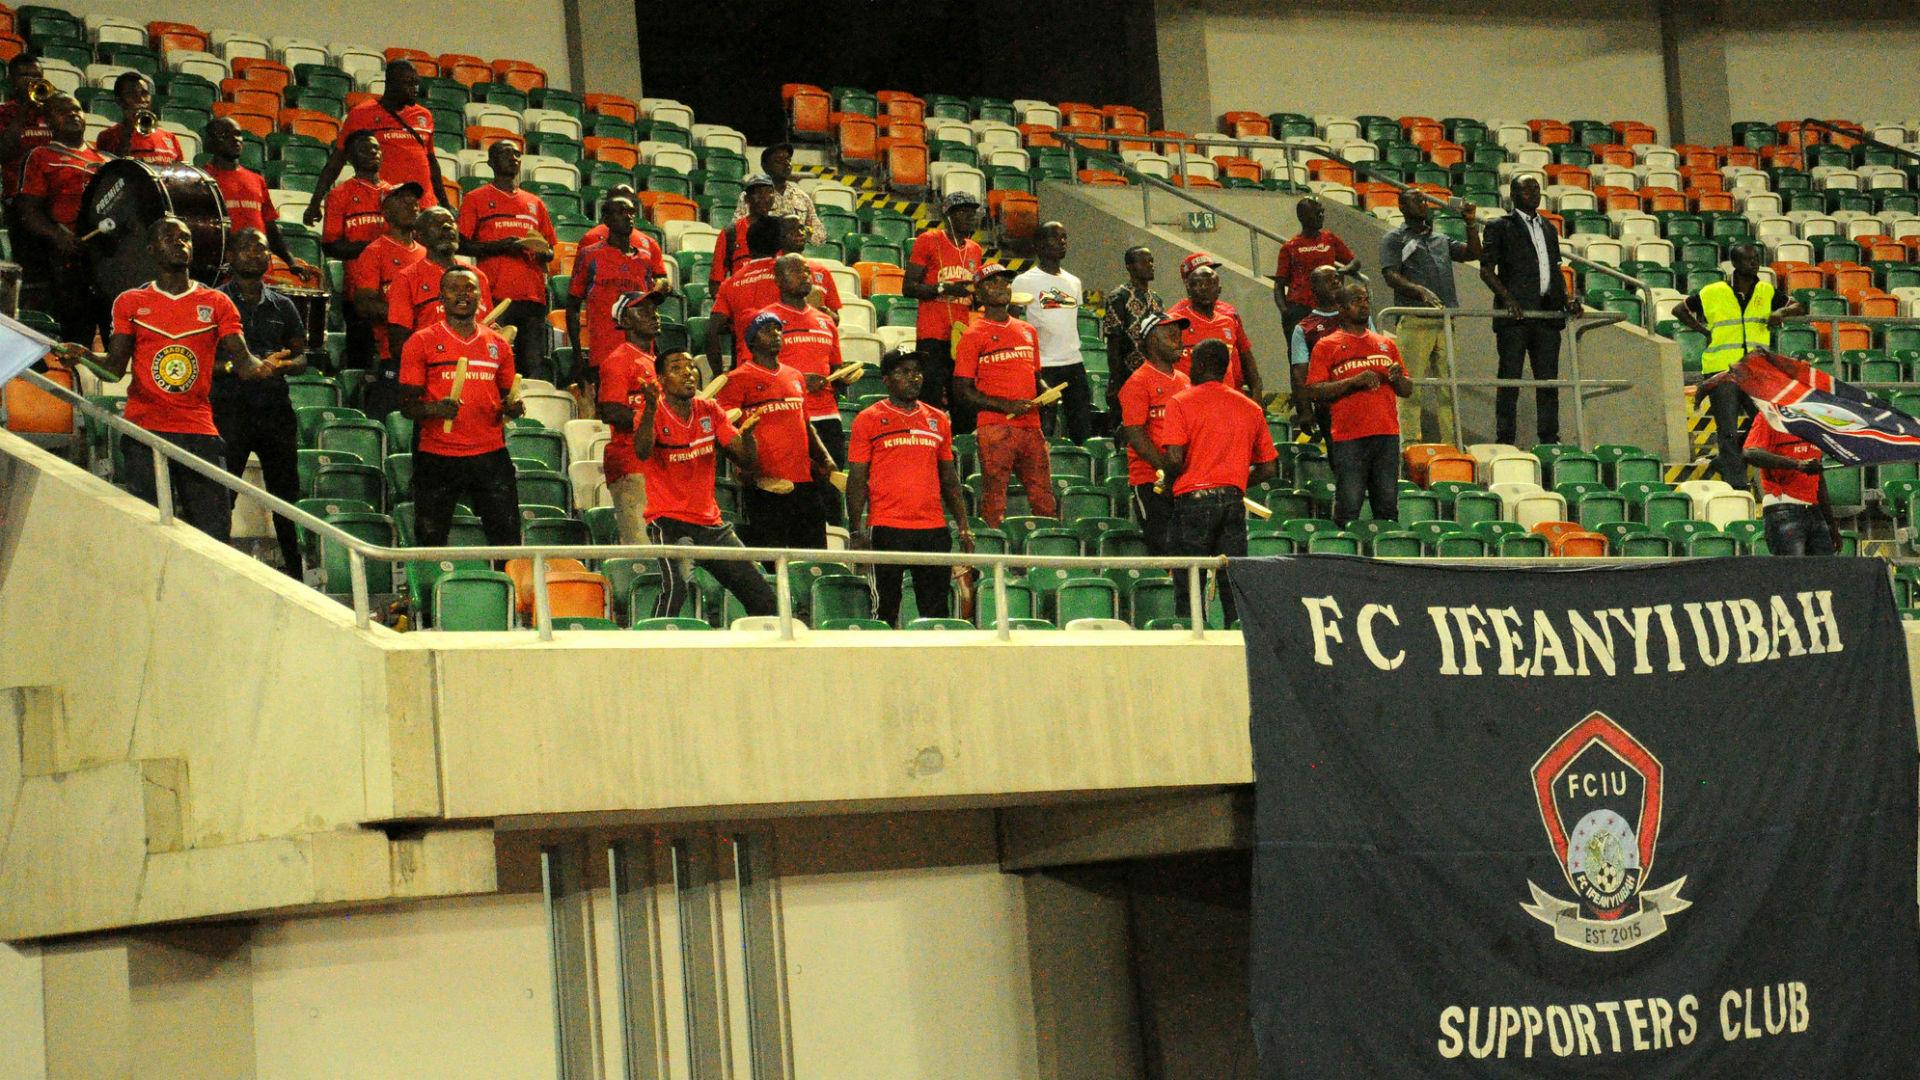 Ifeanyi Ubah fans